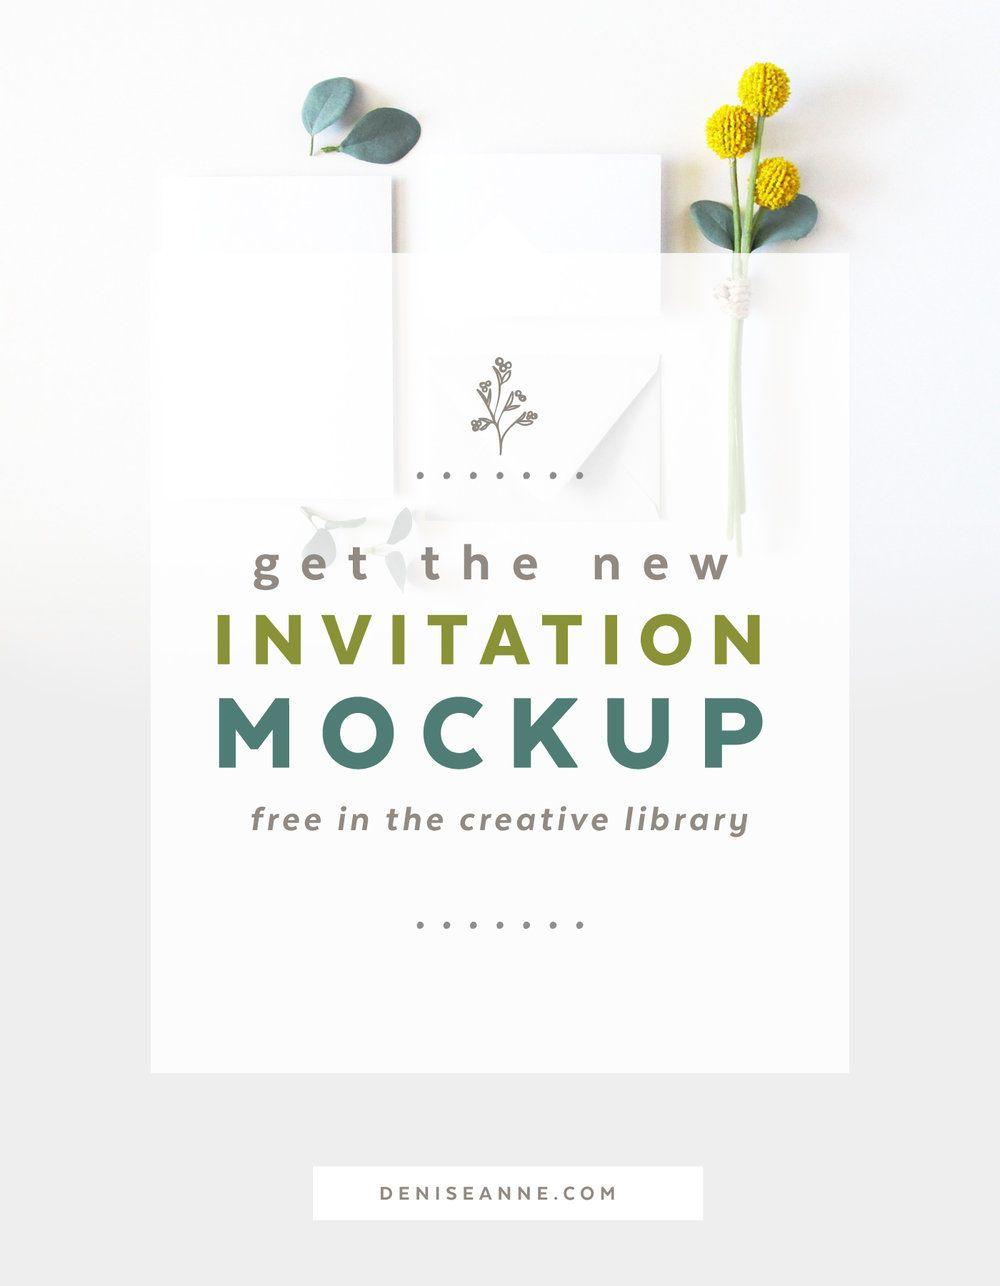 New Invitation Mockup Set | Free wedding invitations and Mock up